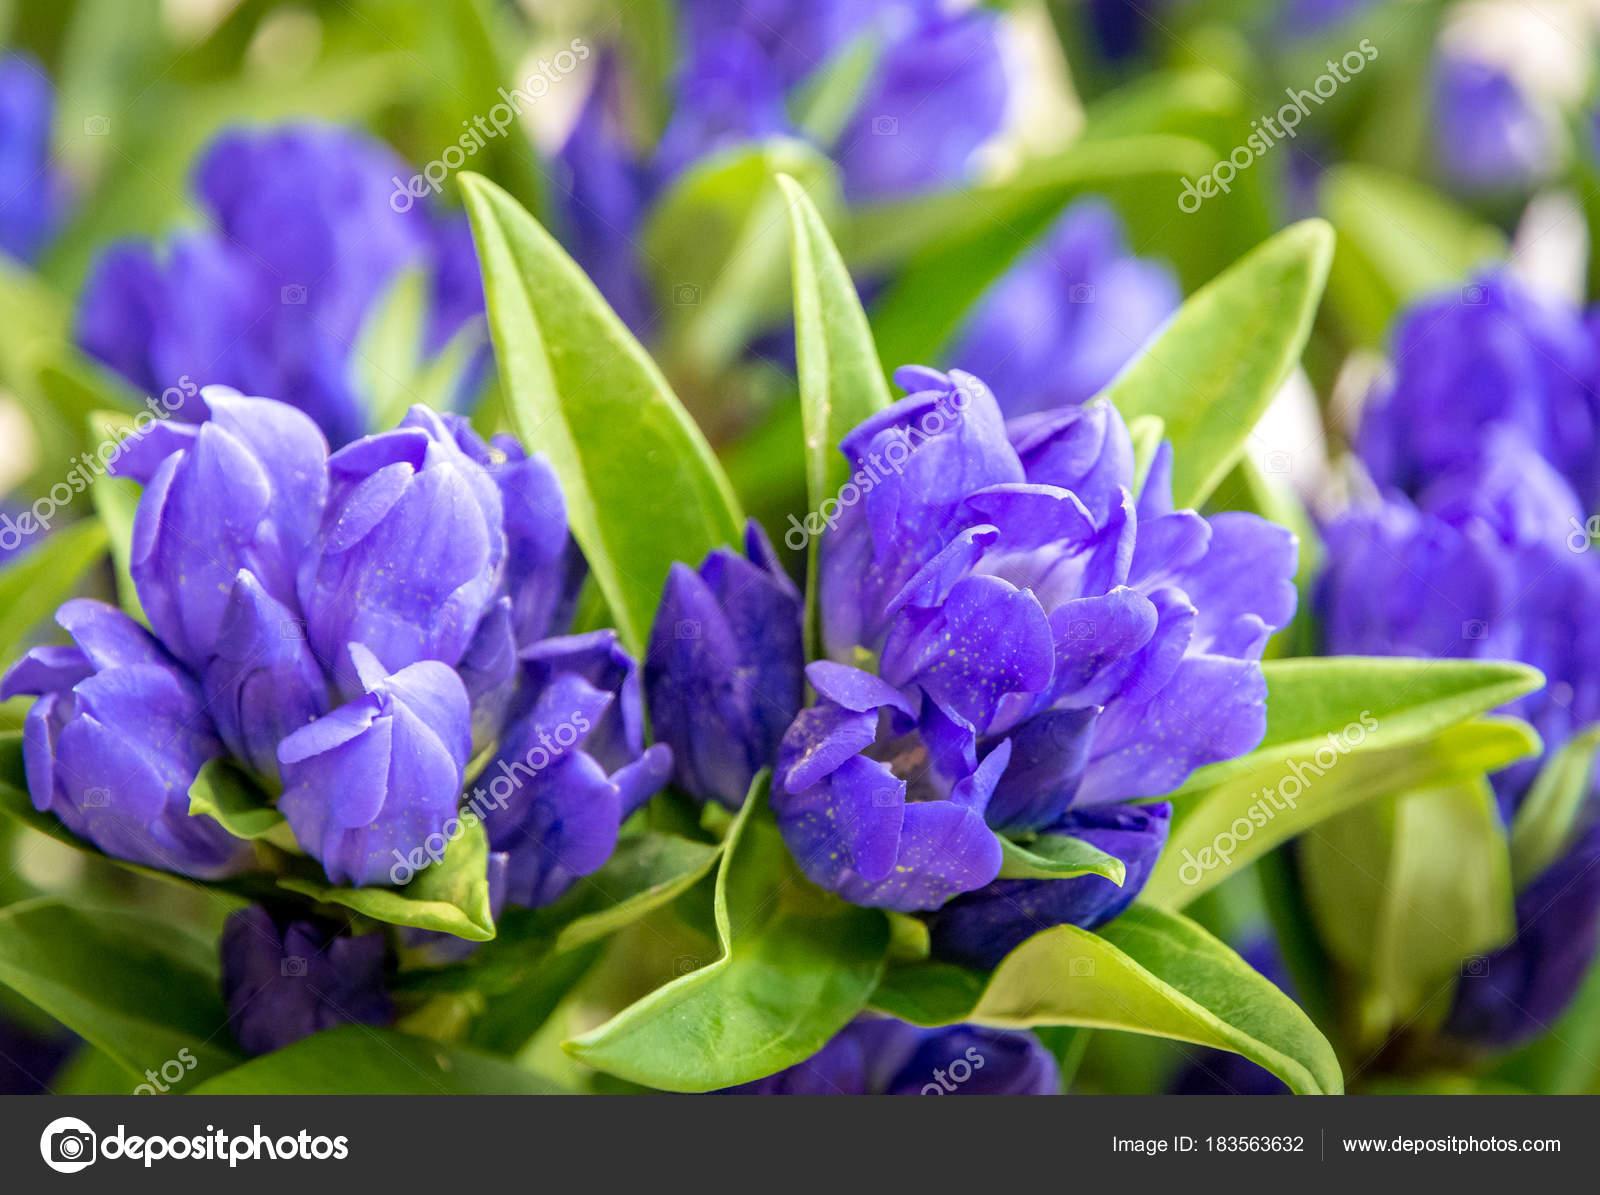 Clustered gentian gentiana triflora is a tall flowering perennial clustered gentian gentiana triflora is a tall flowering perennial plant in the genus mightylinksfo